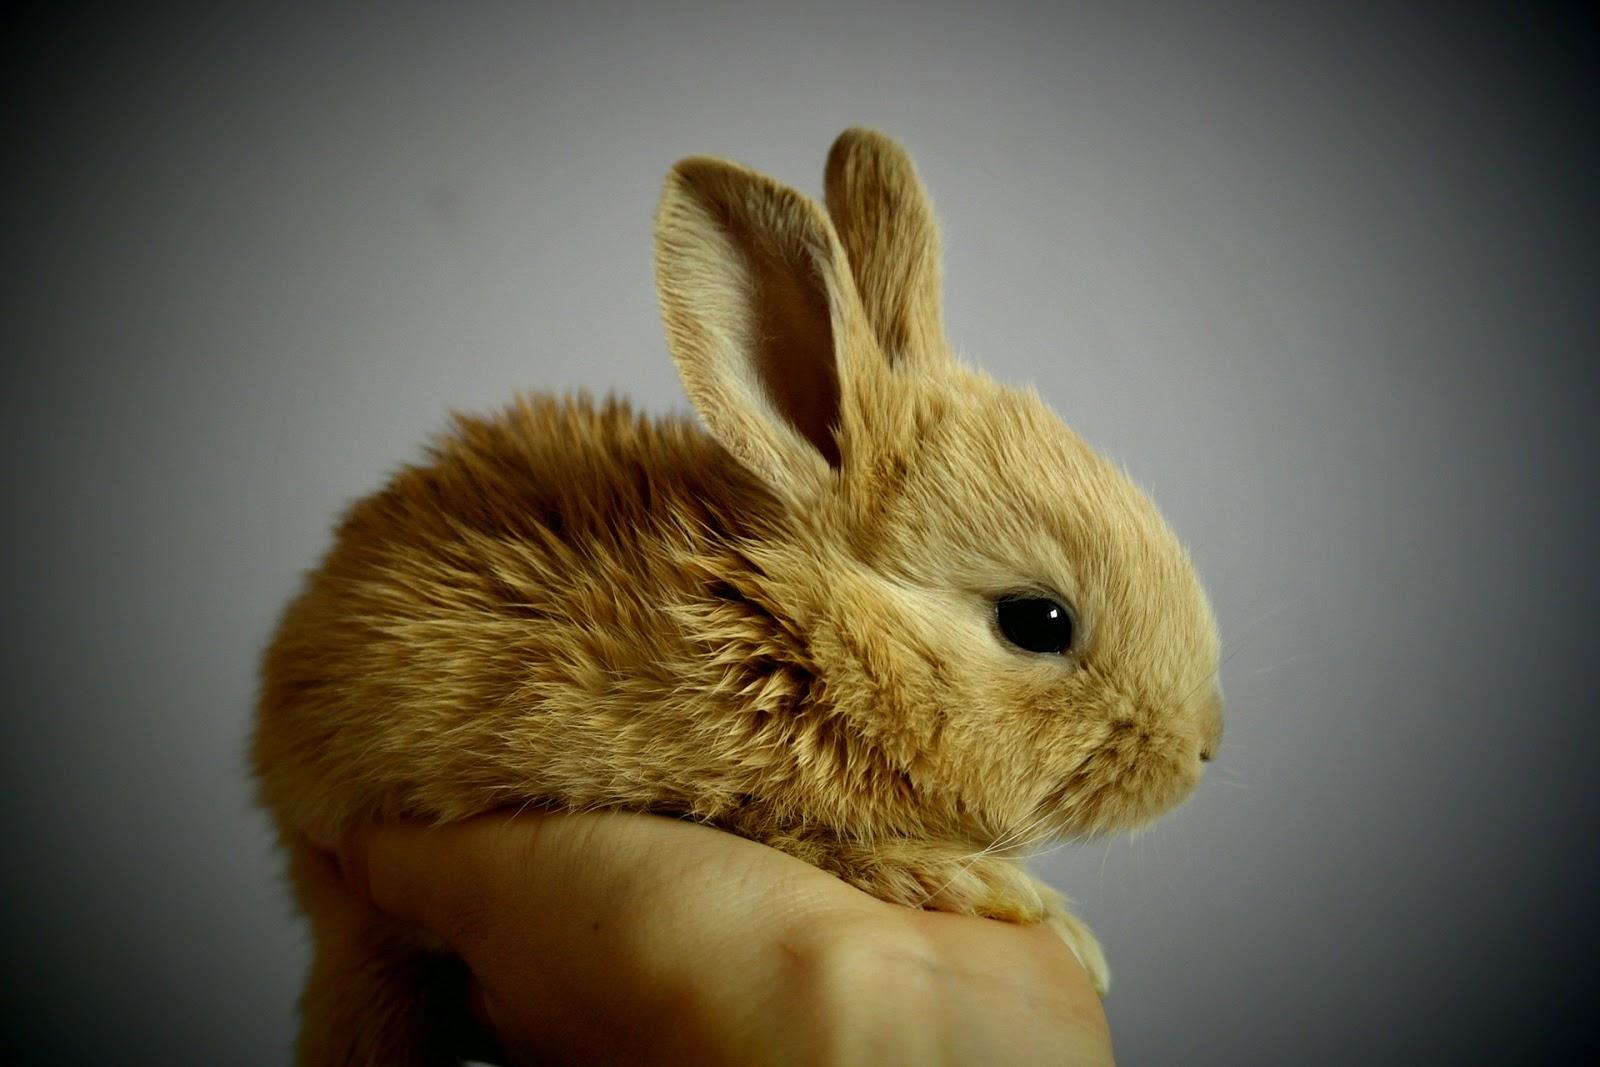 O-DANで発見した掌に乗っている小さな兎の写真